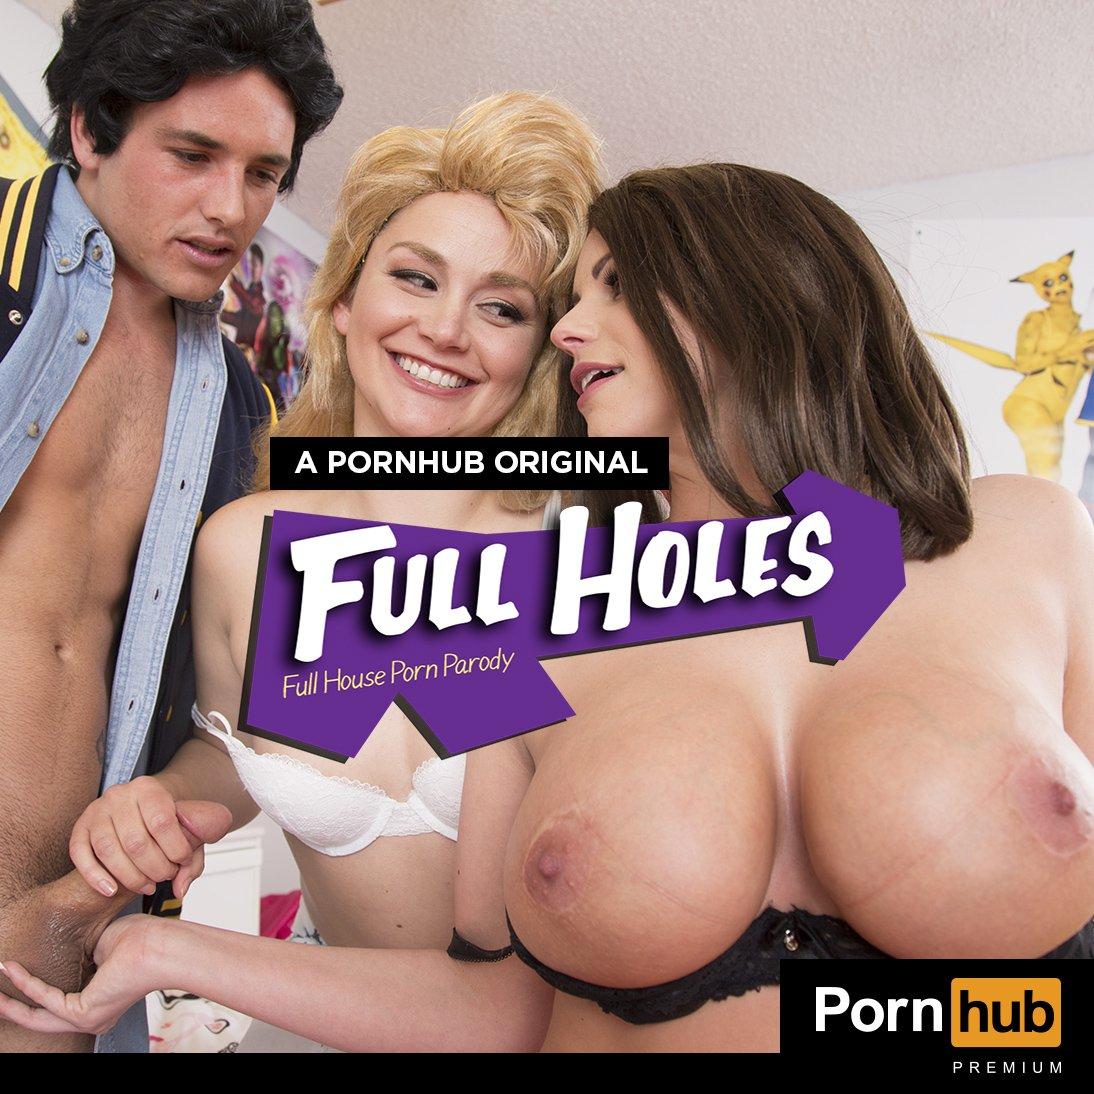 Порно дома порнохуб фото 518-461